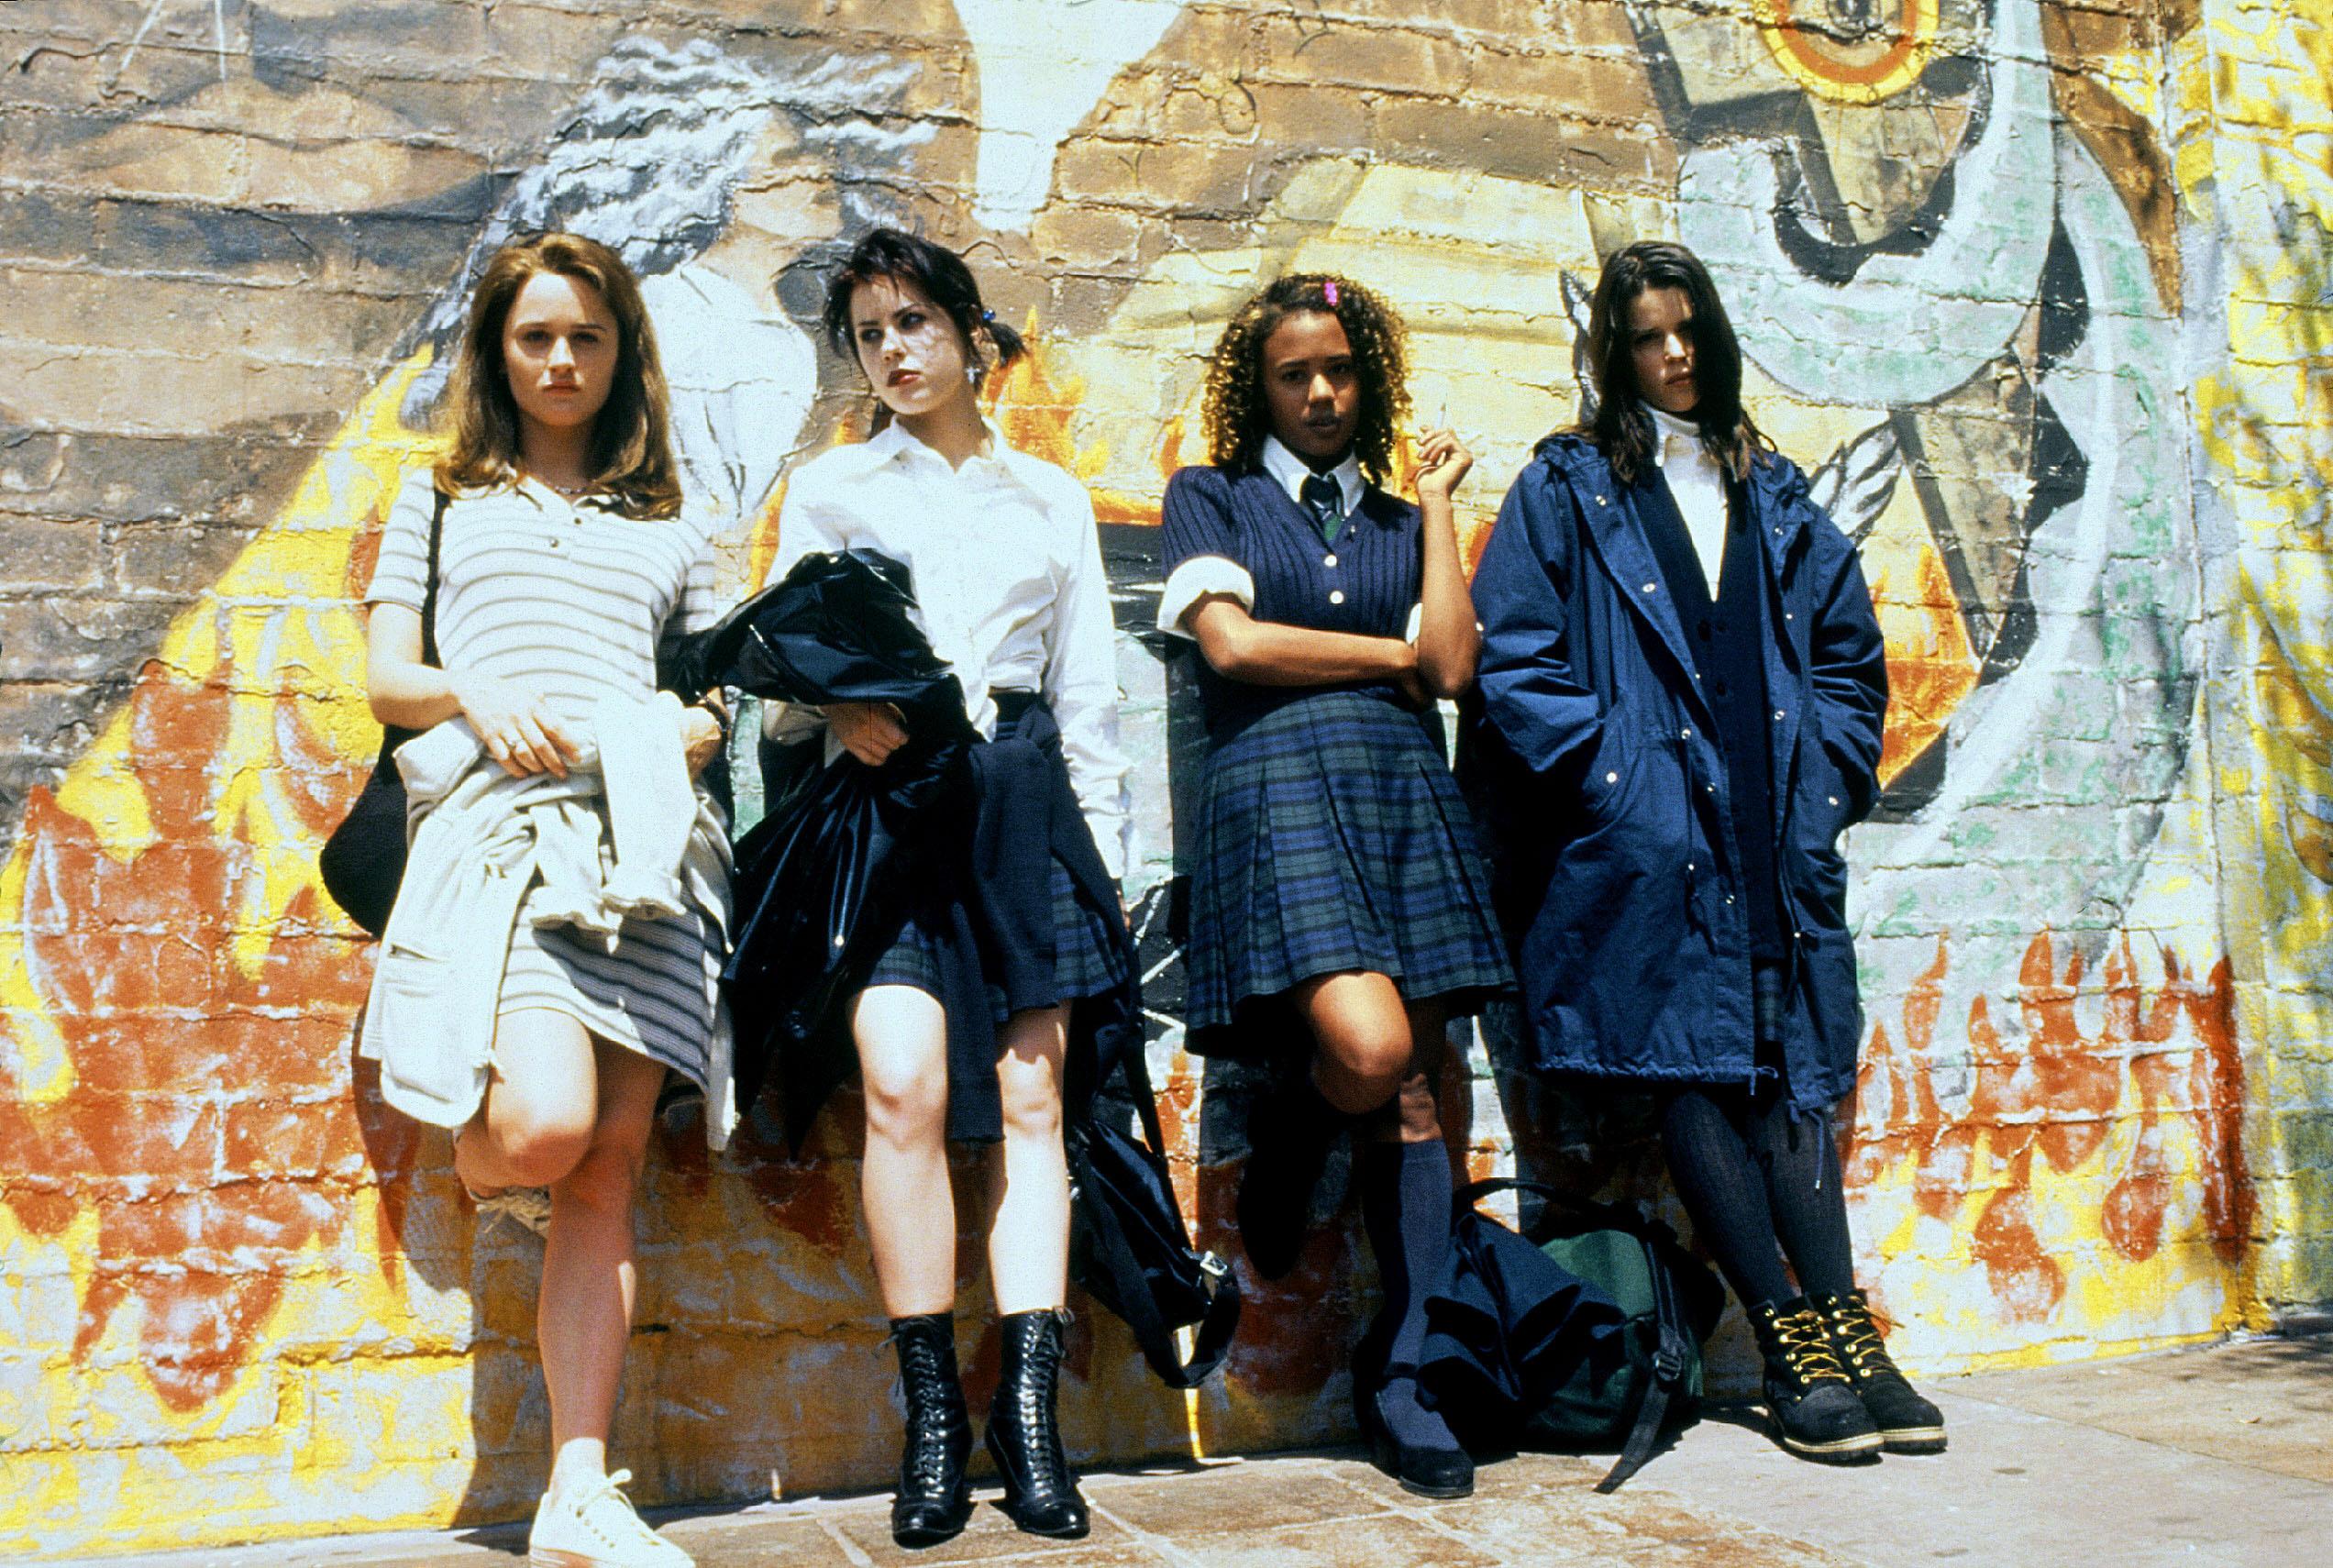 Jovens Bruxas: Magia, bullying e feminismo